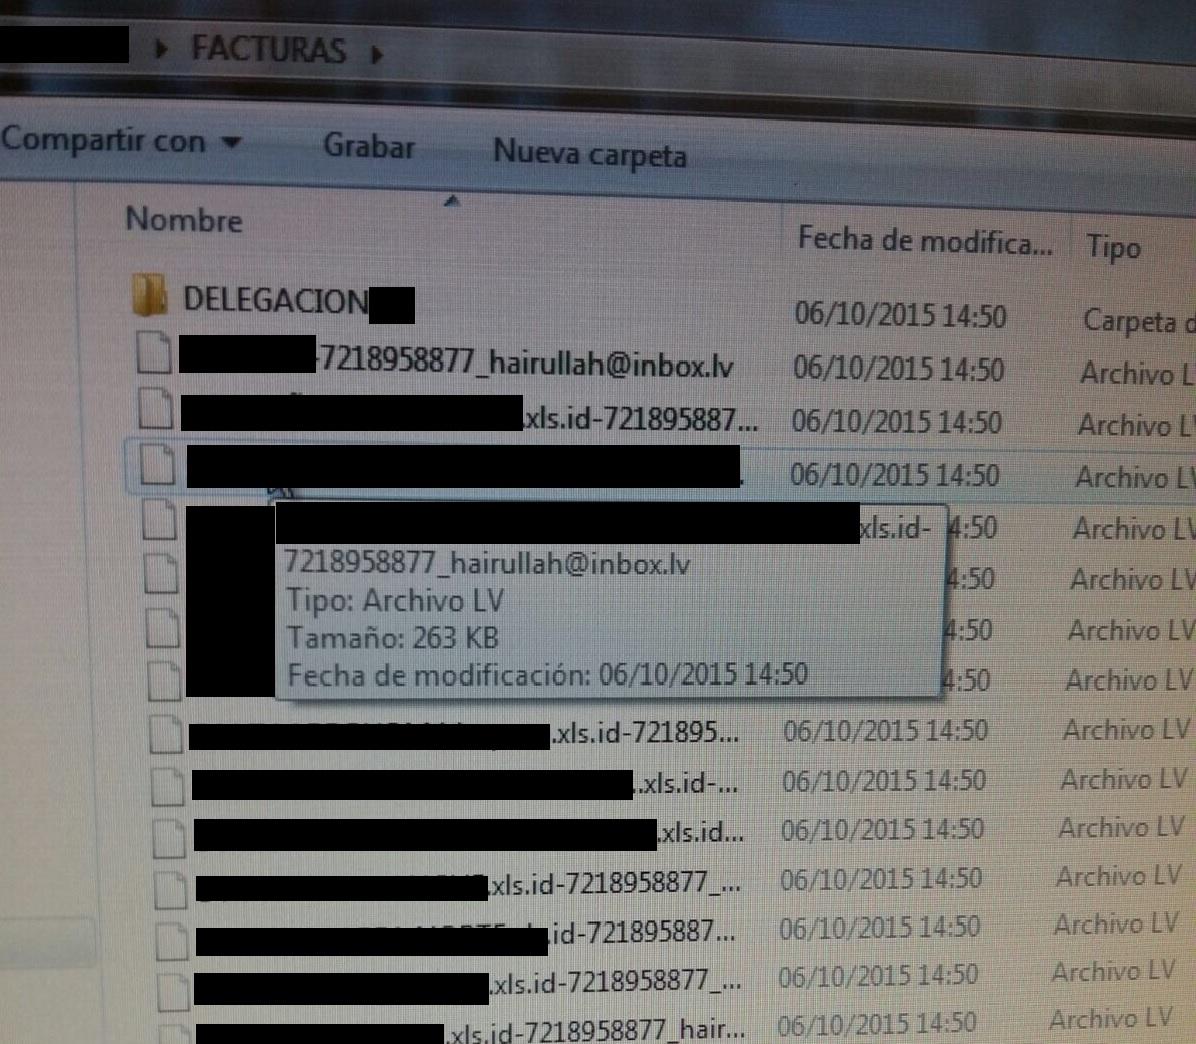 ransom_oct15a